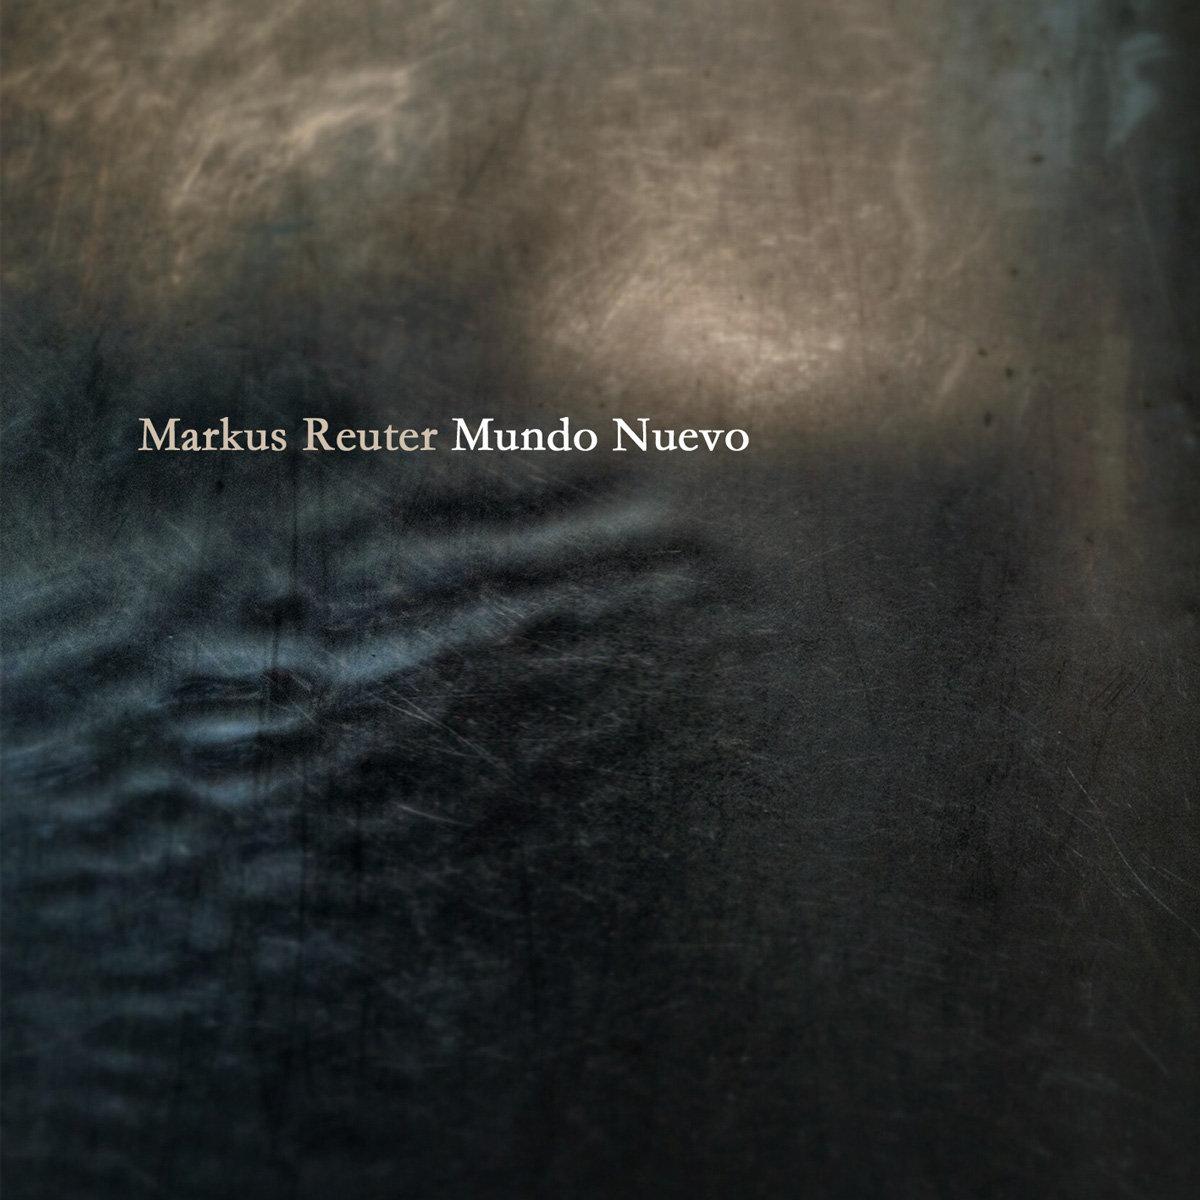 Markus Reuter — Mundo Nuevo